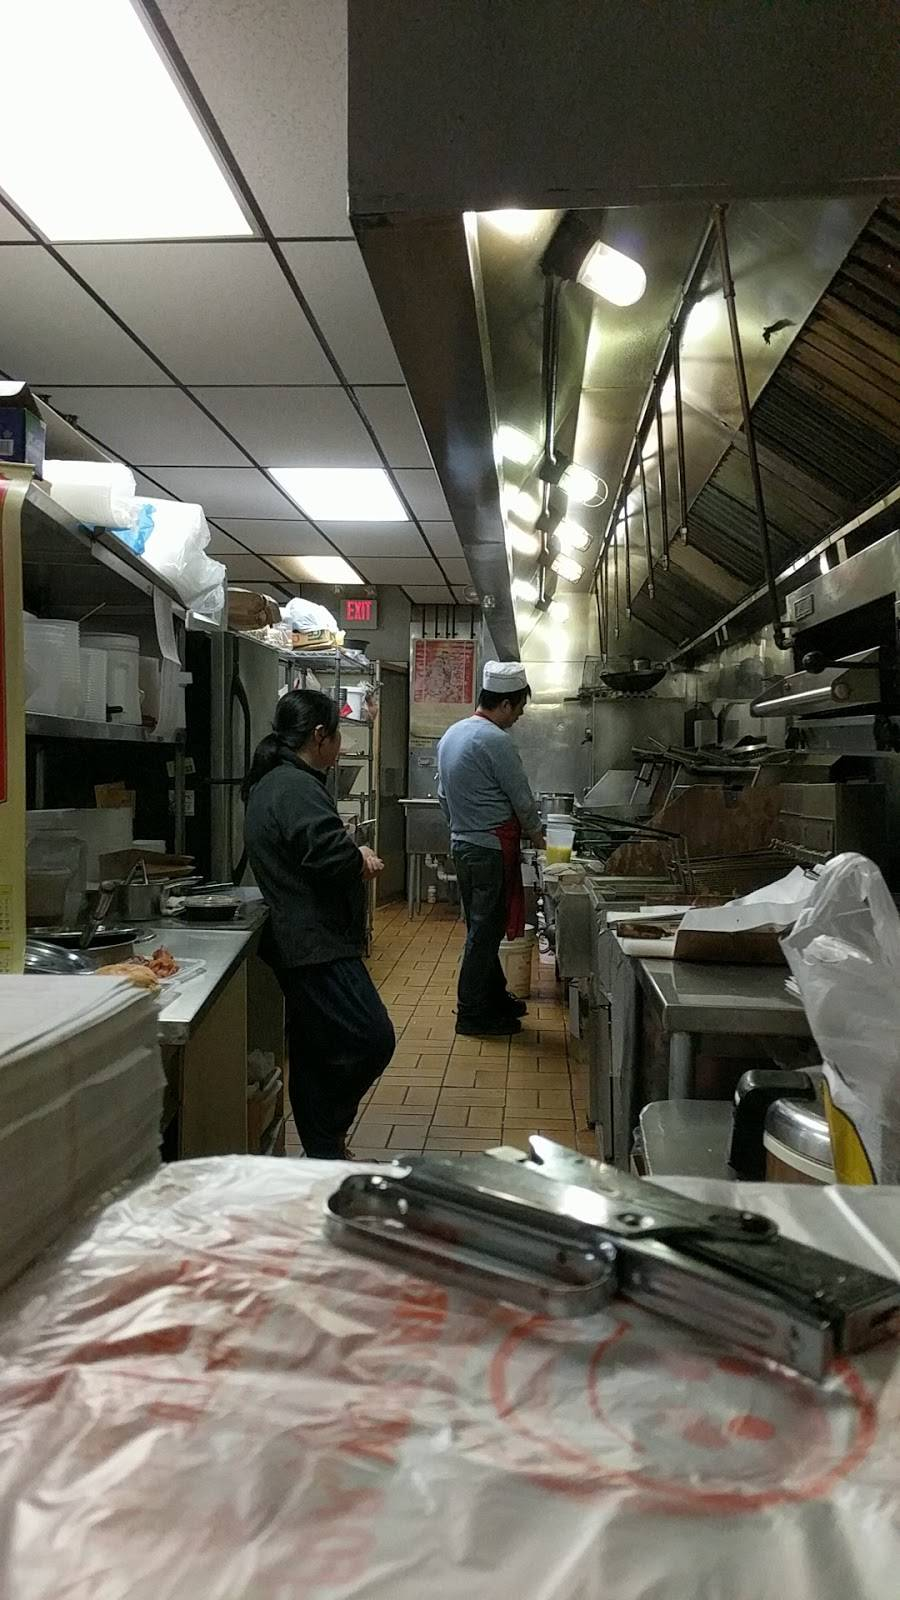 Hunan Express   restaurant   161 N Washington Ave, Bergenfield, NJ 07621, USA   2013841880 OR +1 201-384-1880